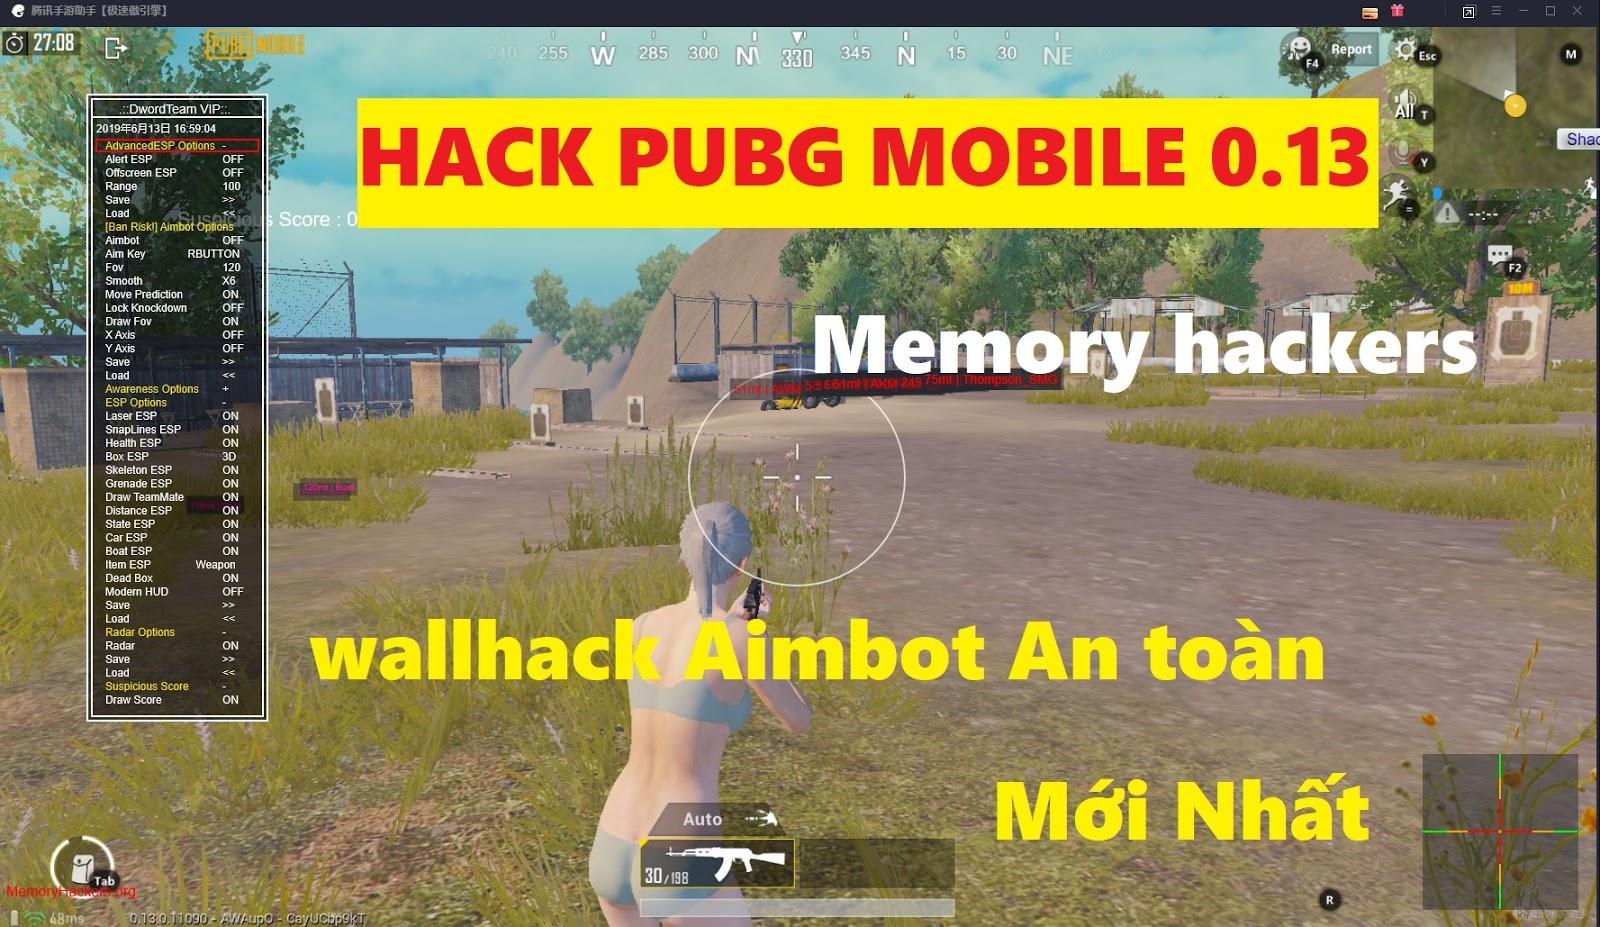 Memory Hackers PUBG - Hack PUBG Mobile PC | Hack PUBG Giả Lập Mới